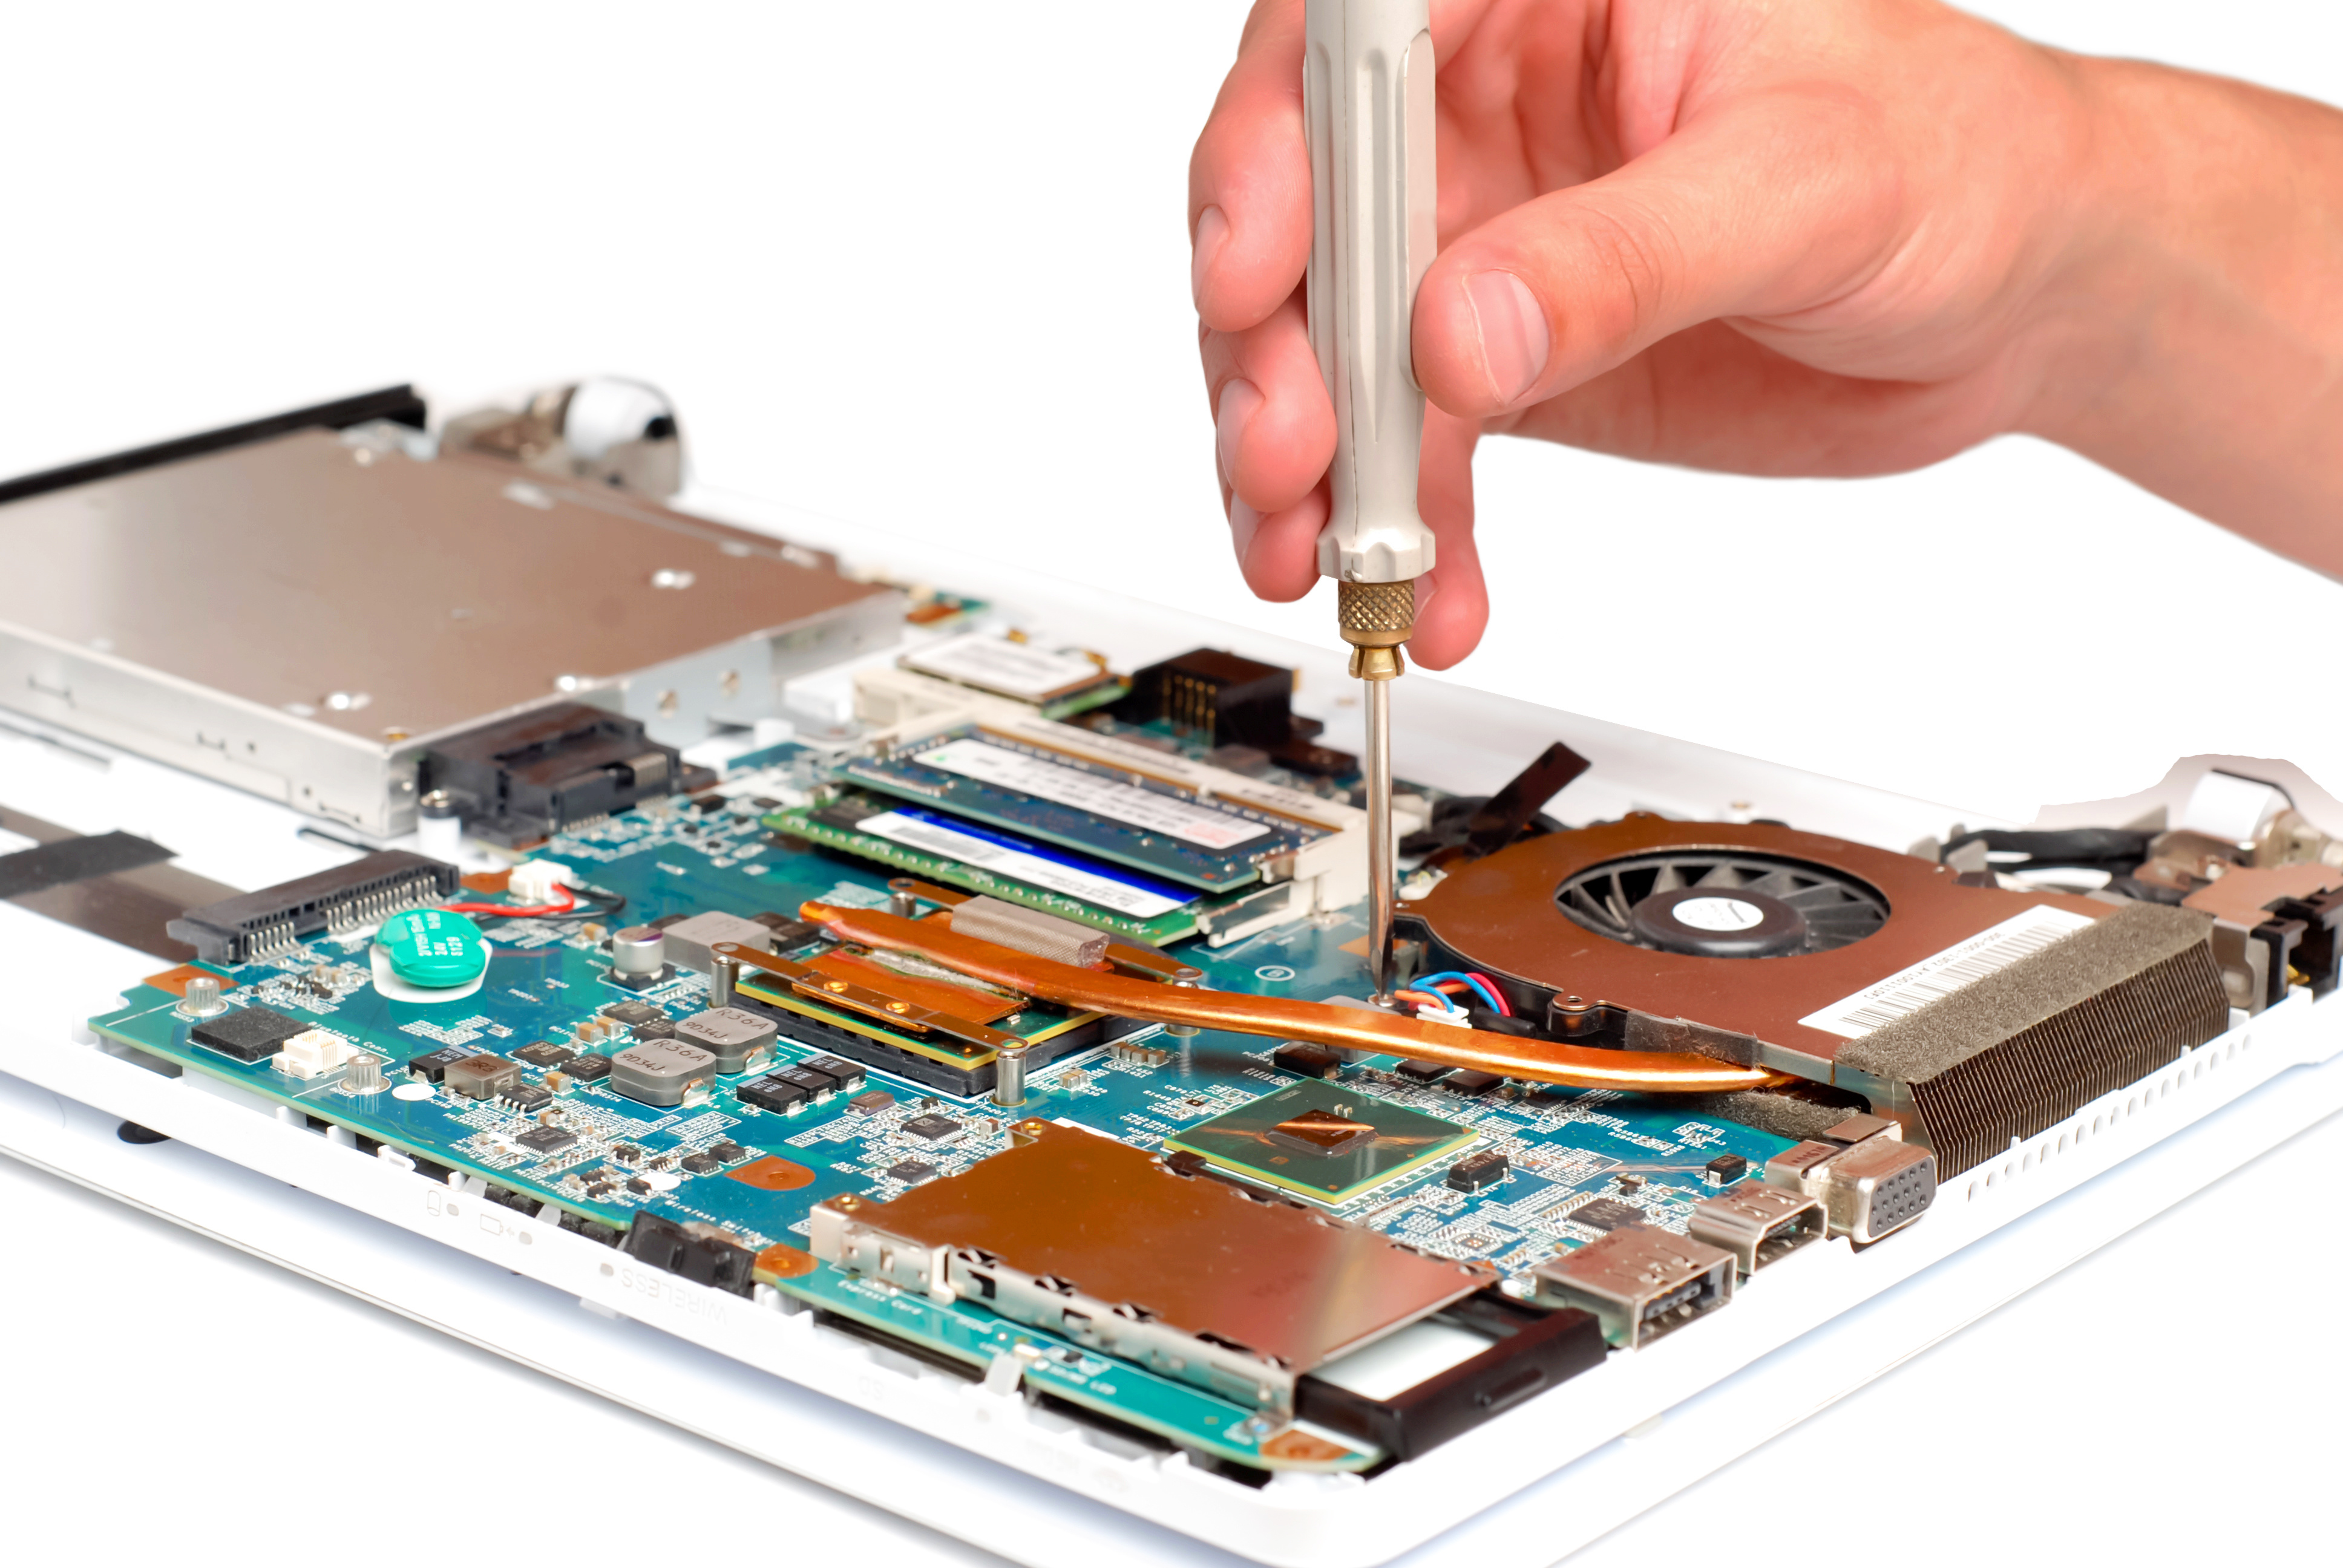 Laptop Repair Sydney – Laptop Repair Technician